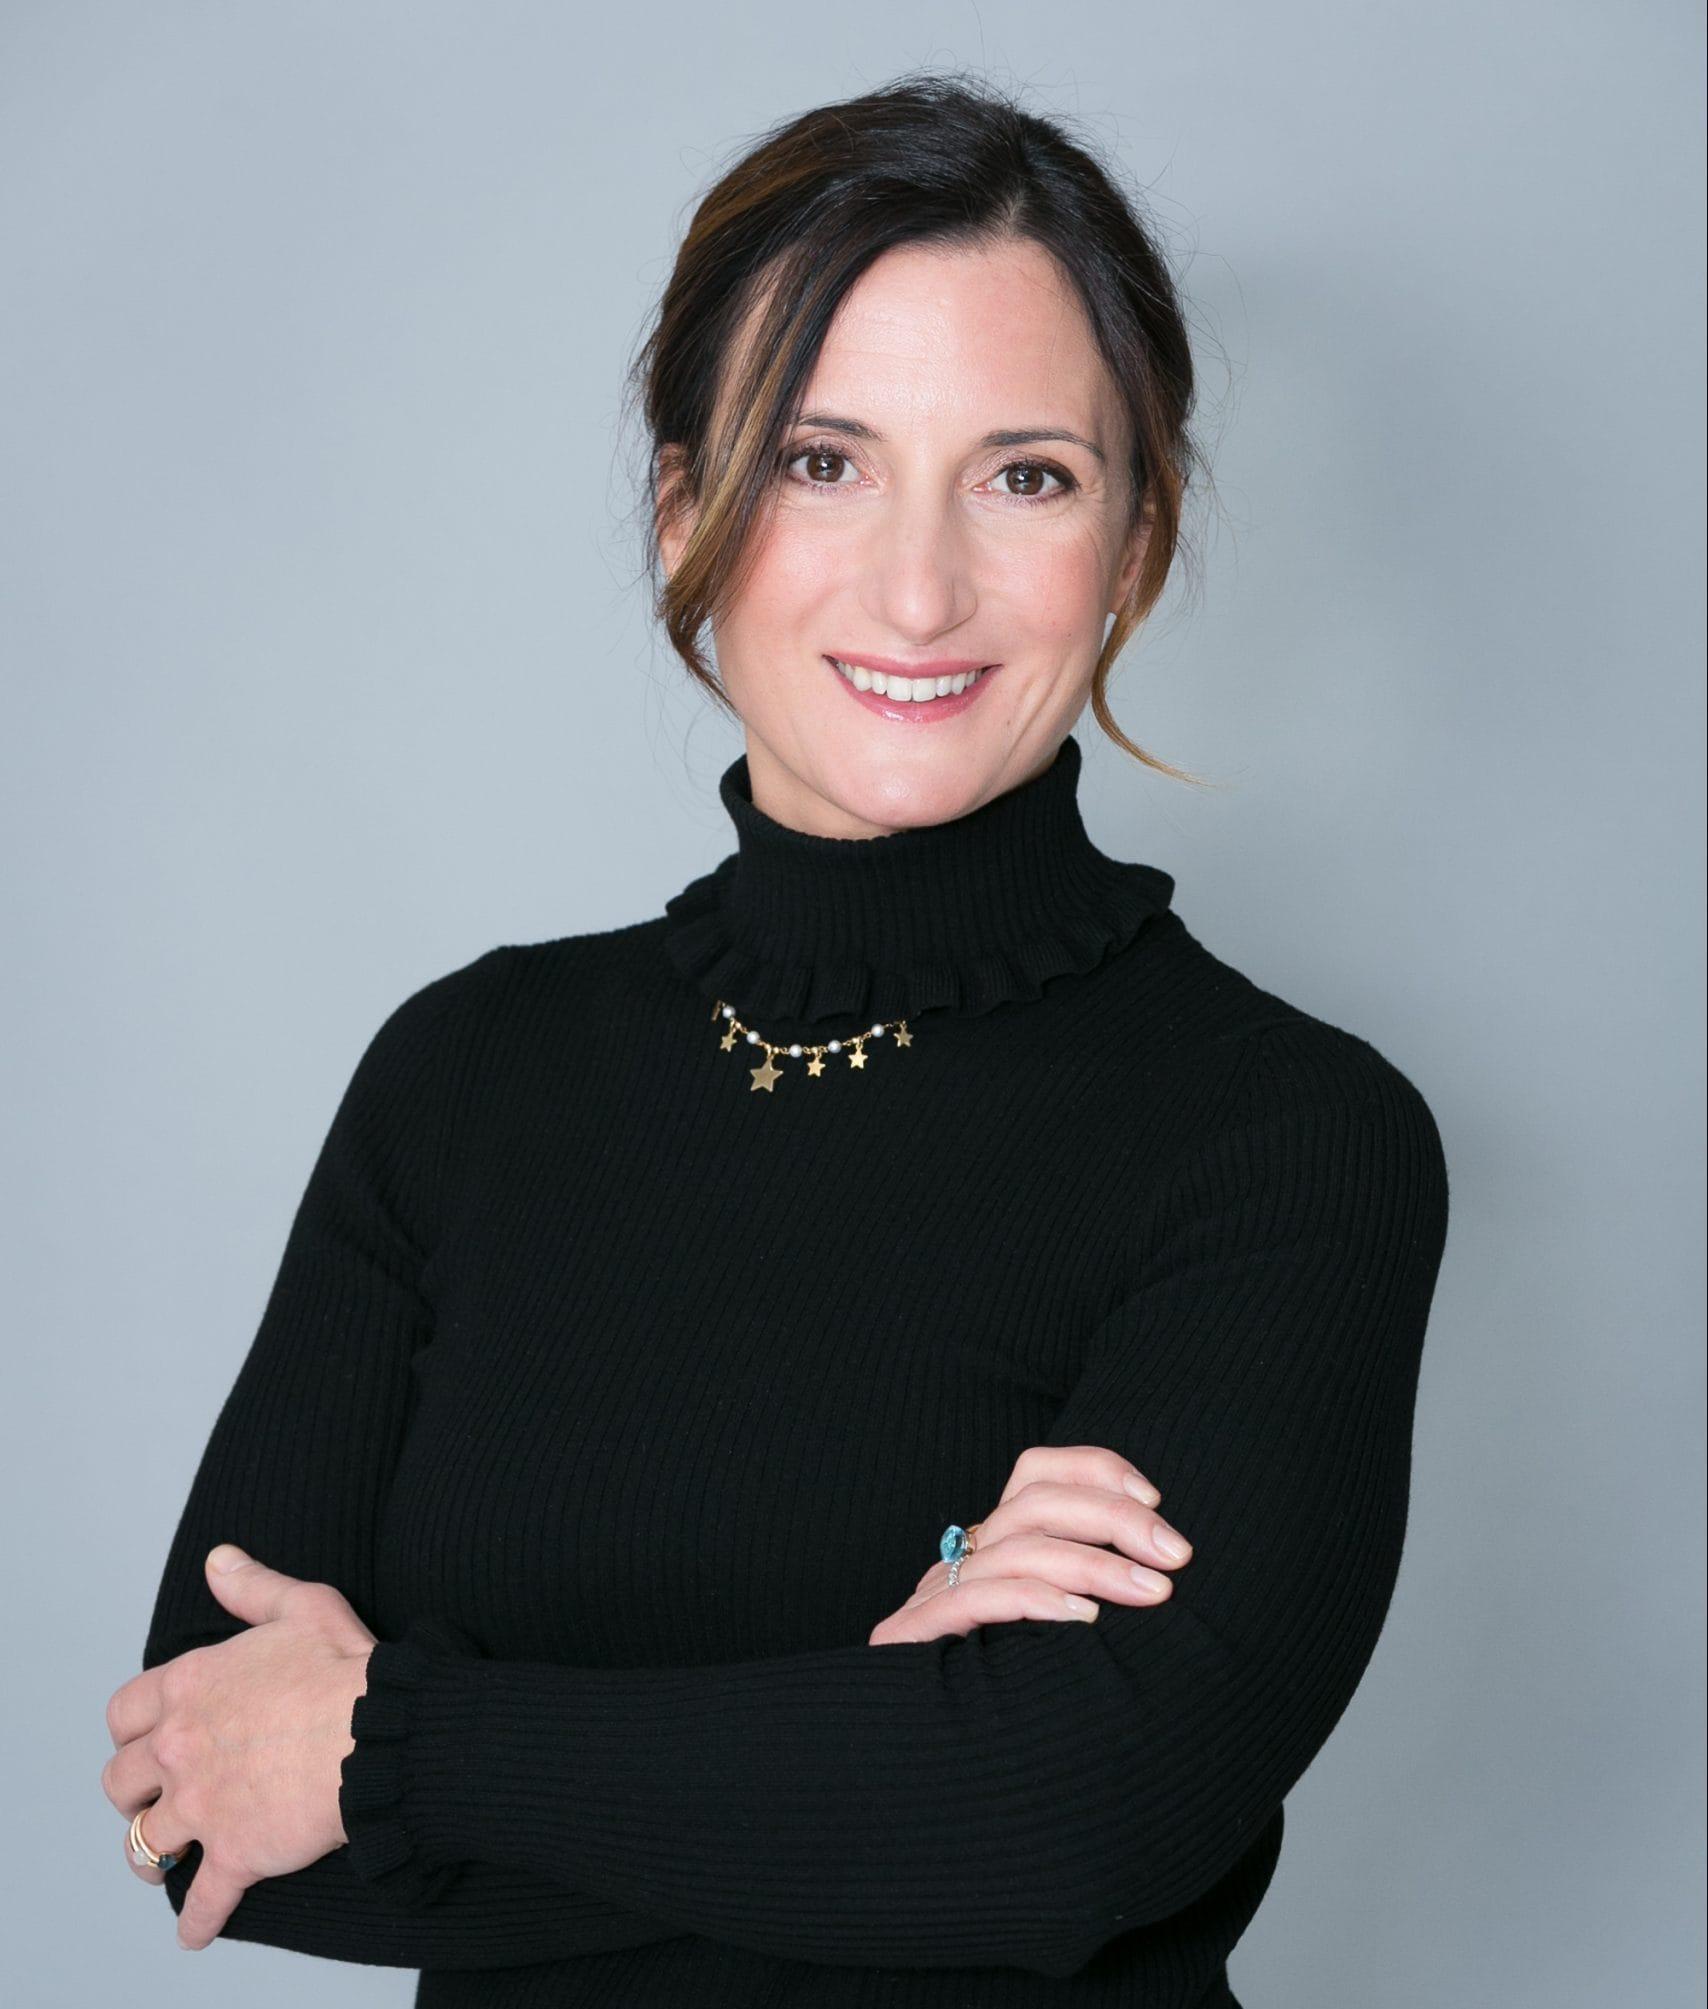 Adele Schipani